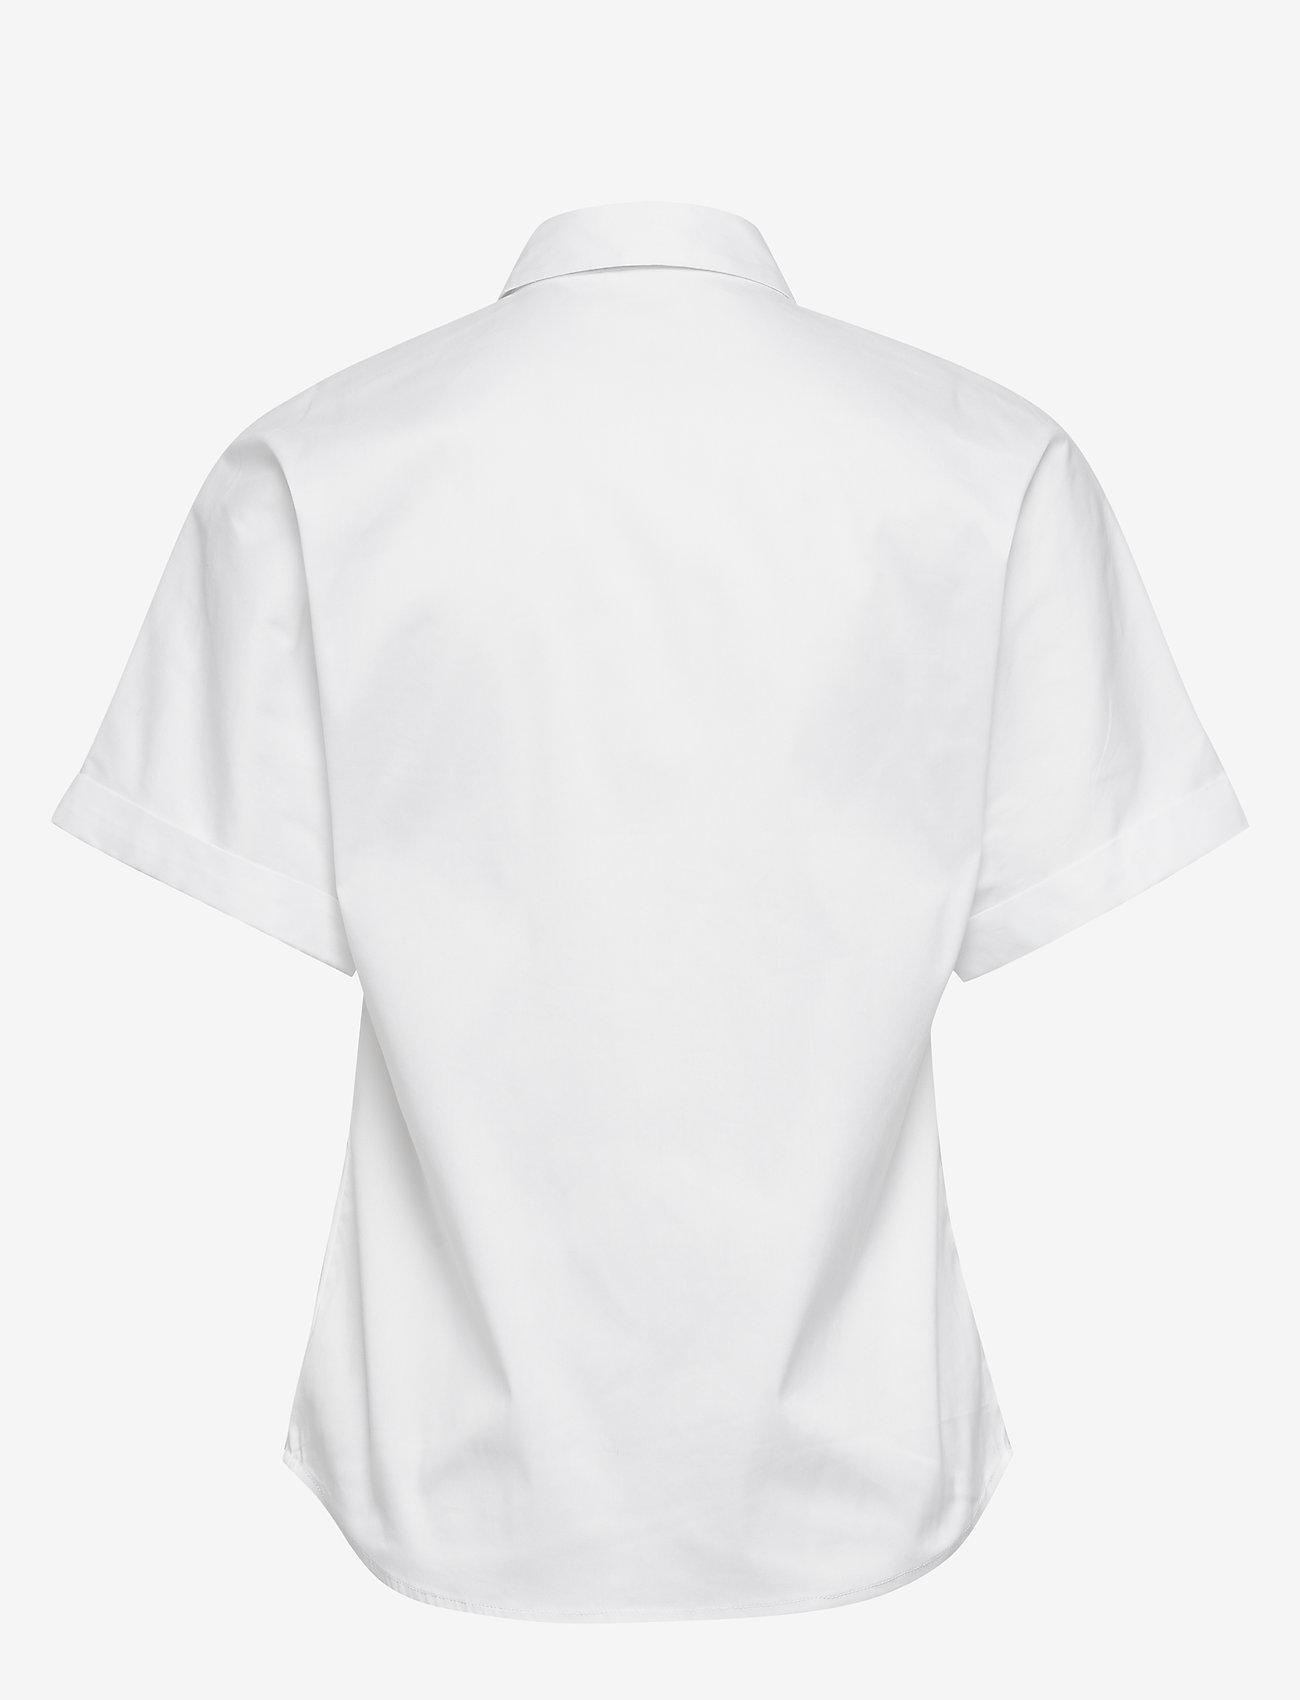 Esprit Collection Blouses Woven - & Shirts